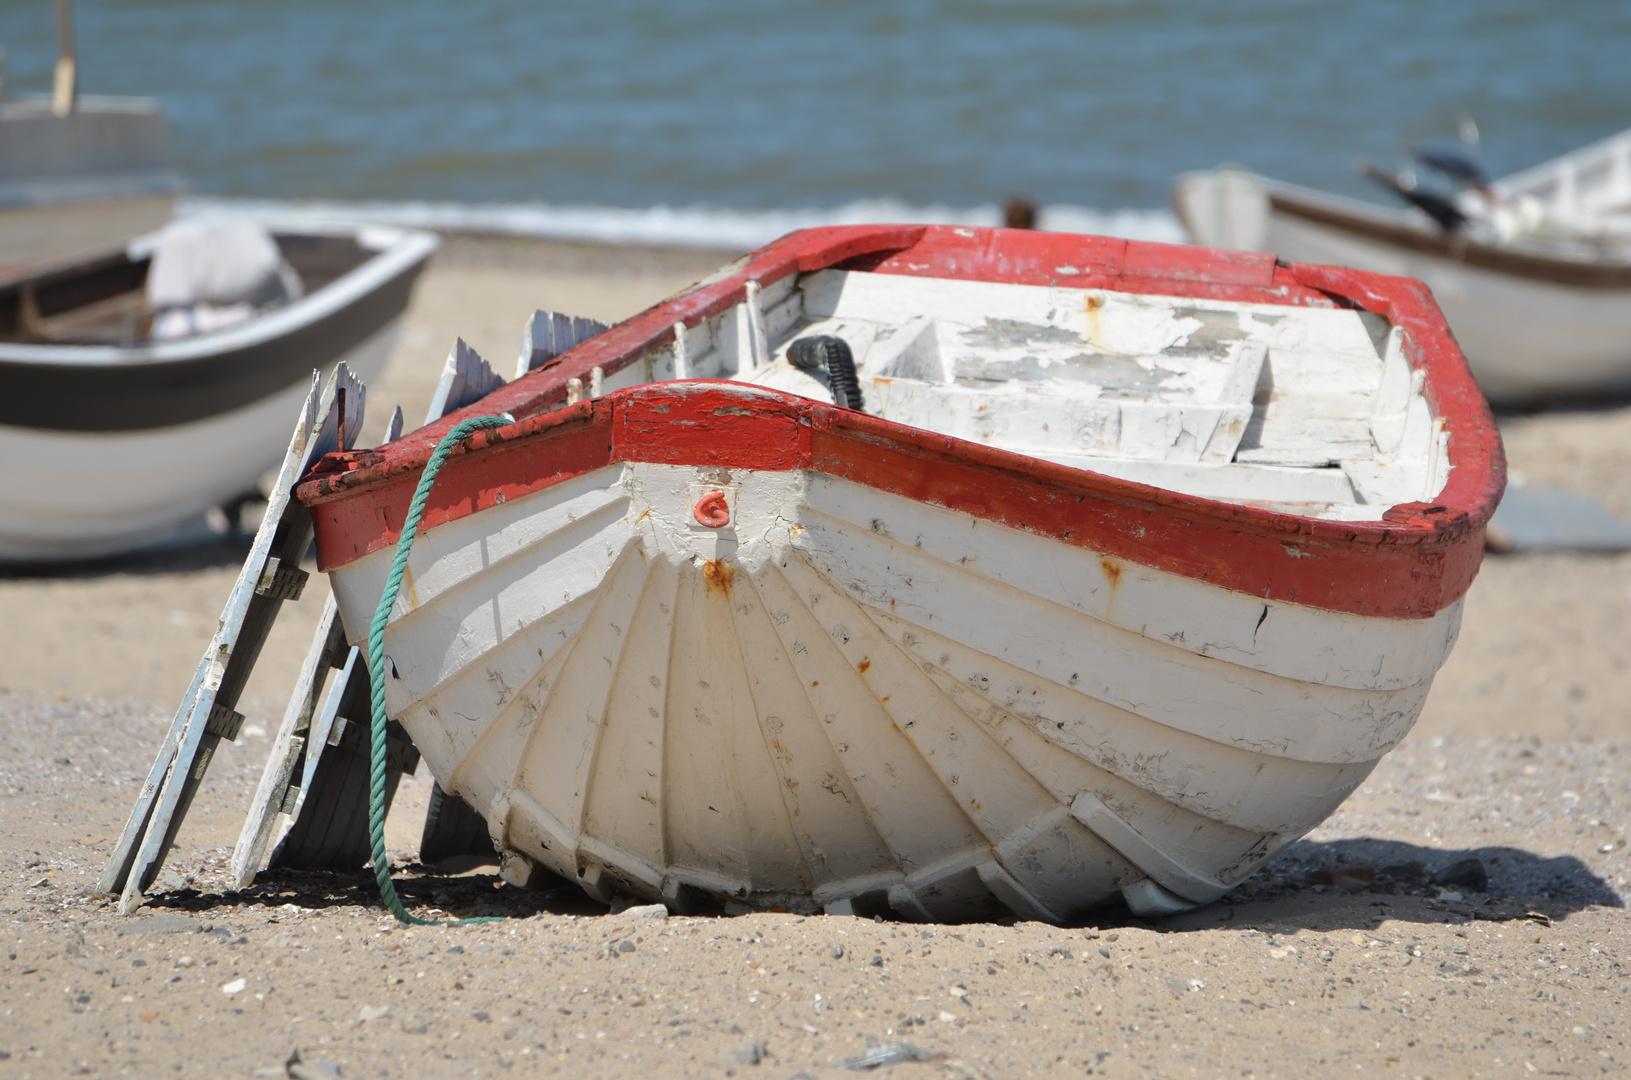 altes Ruderboot am Strand - Norre Vorupor - Dänemark